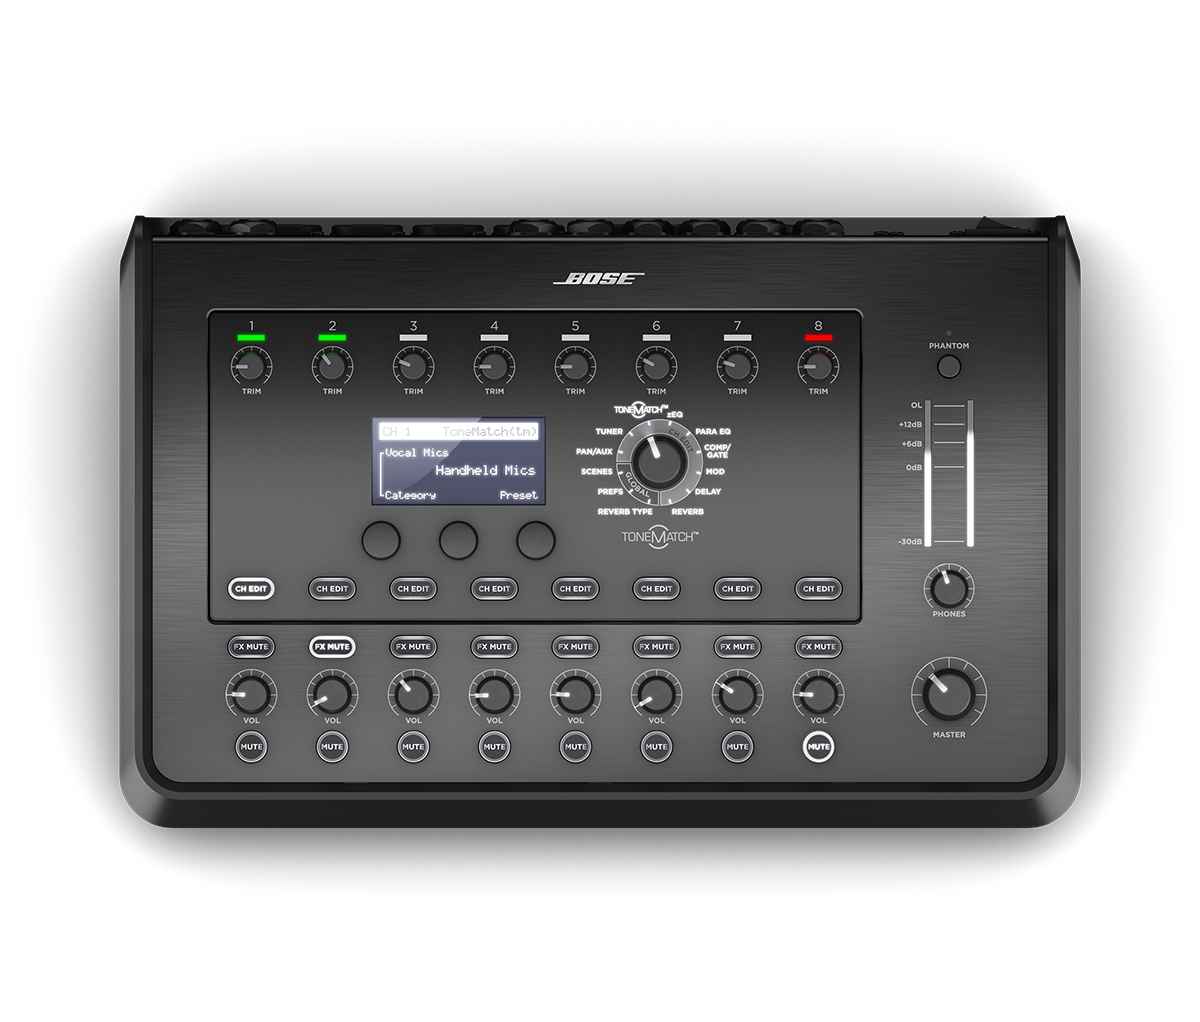 Bose T8S ToneMatch mixer Black 785491-0110